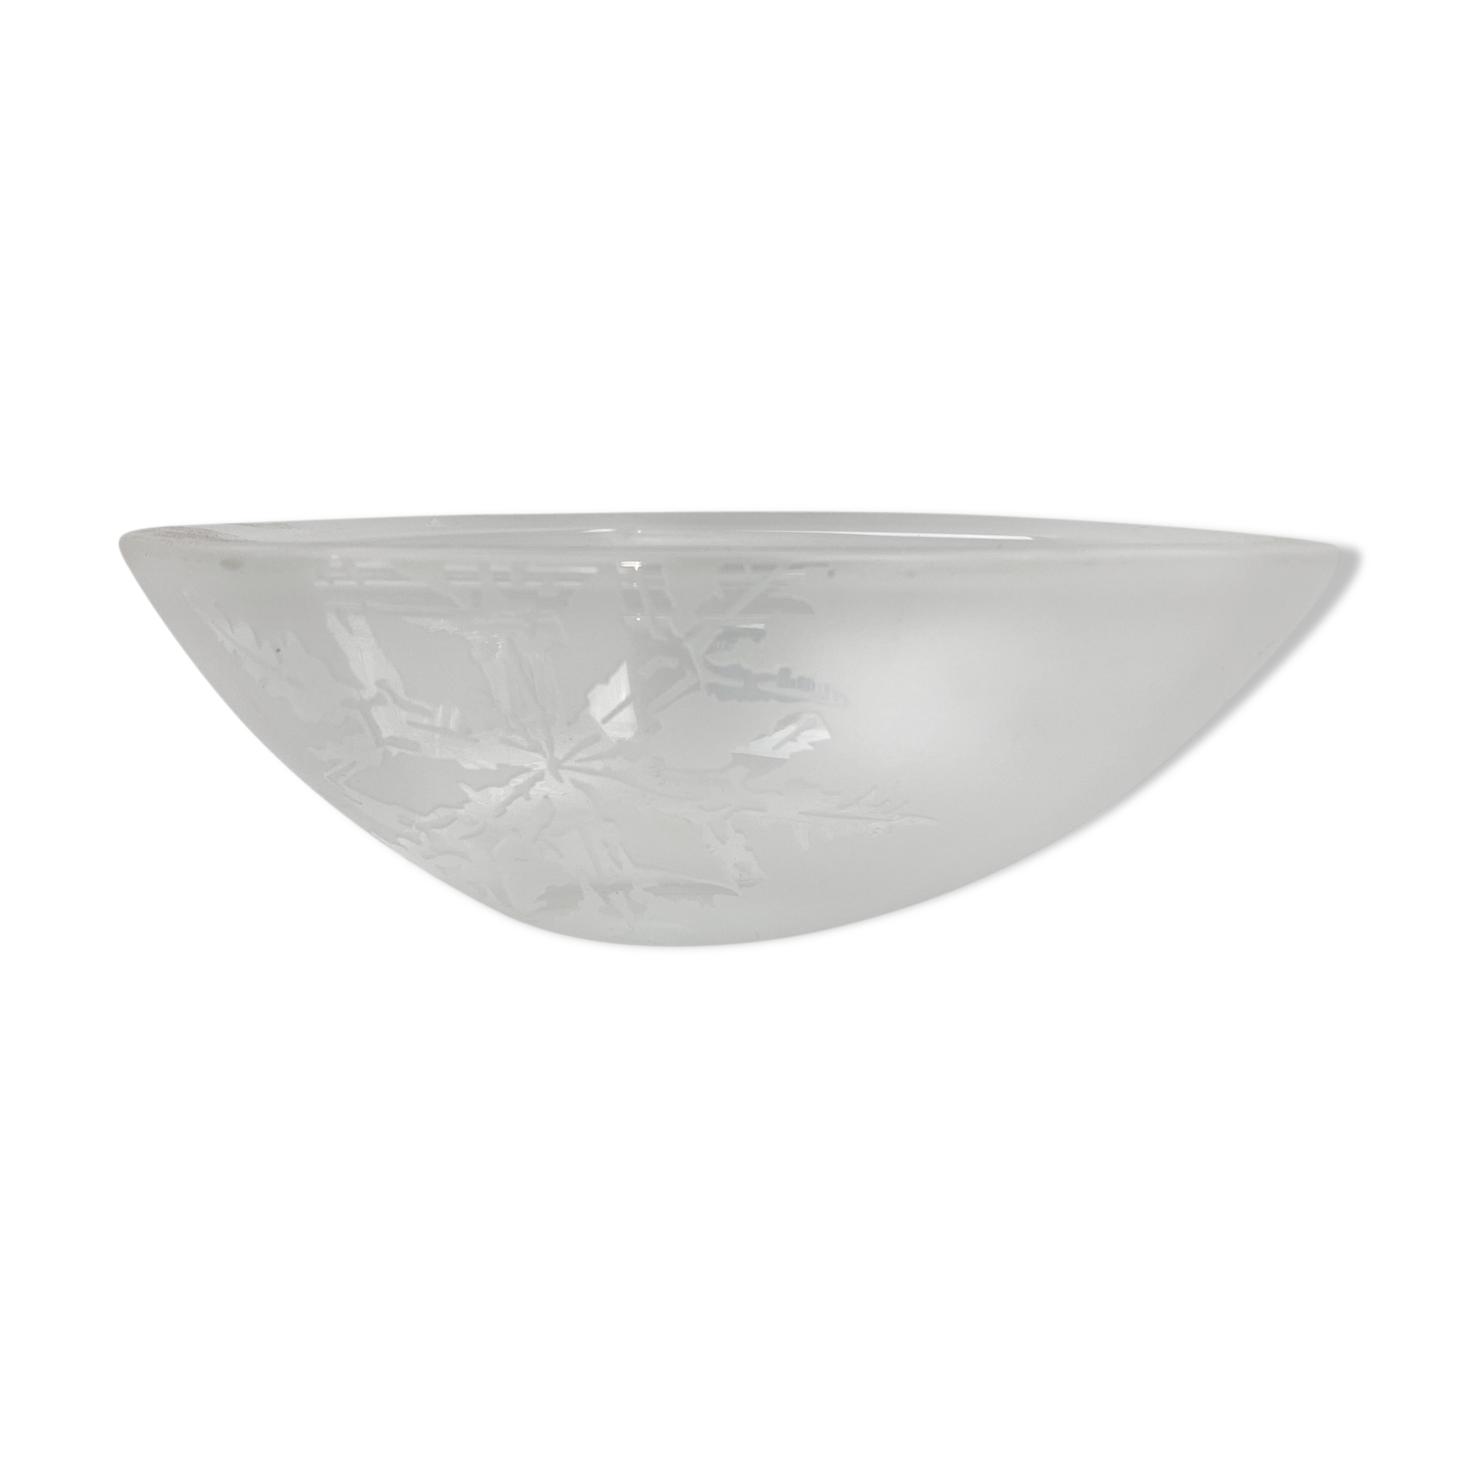 Vide-poche cristal Villeroy&Boch motif flocons